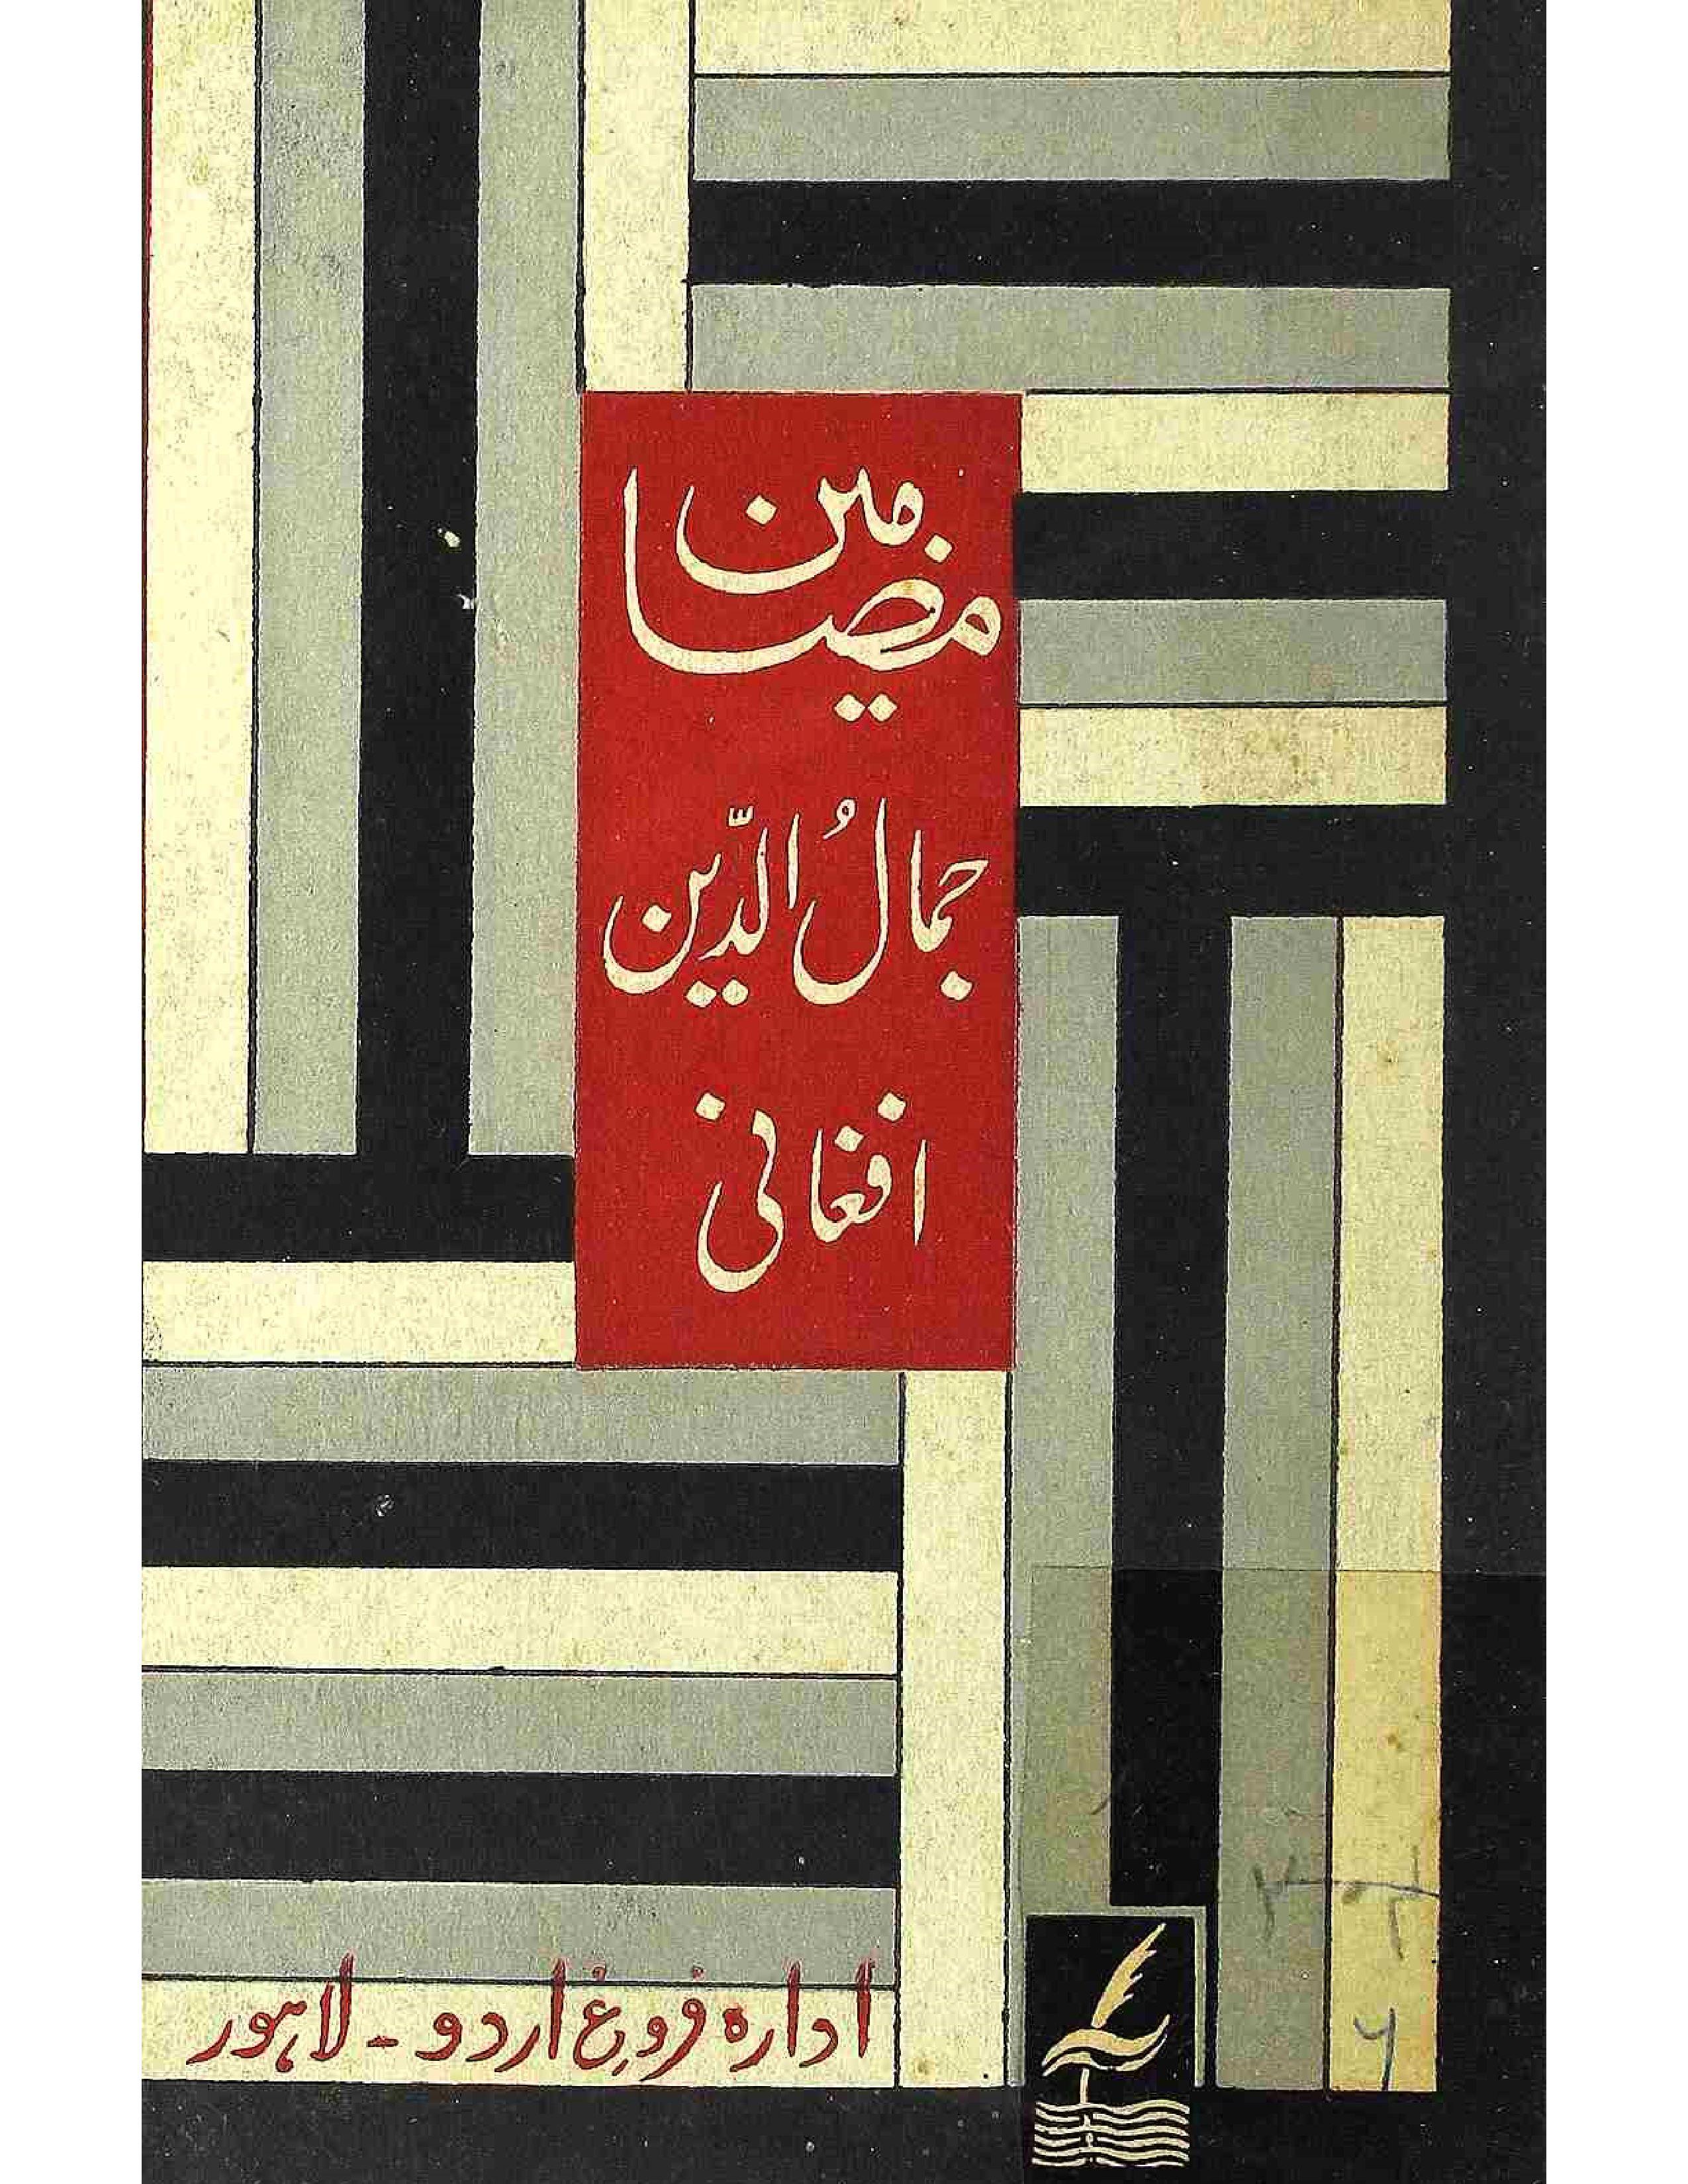 Mazameen-e-Jamaluddin Afghani